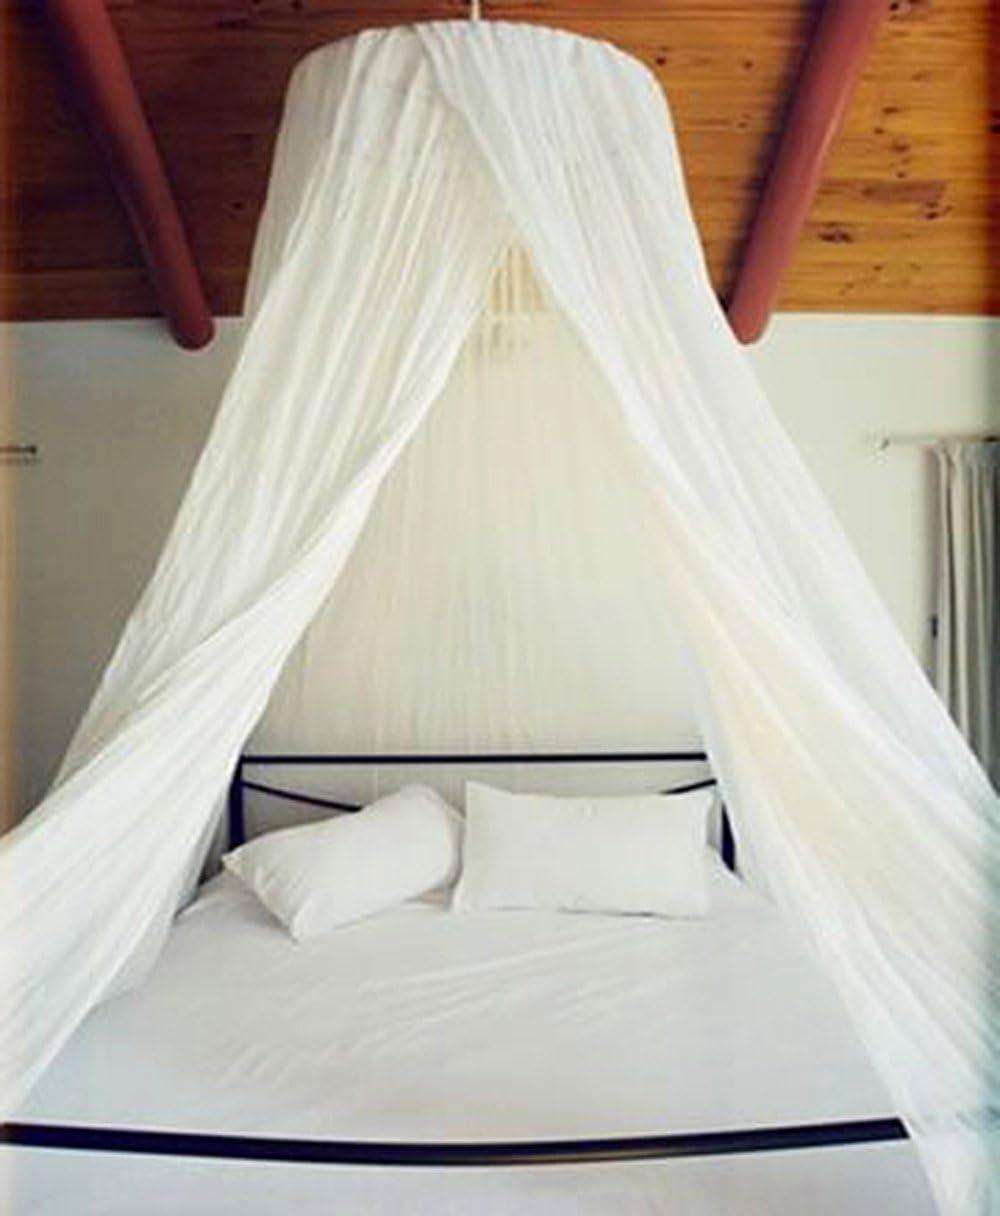 - Amazon.com: Dreamma Elegant White Round Bed Canopy Mosquito Net